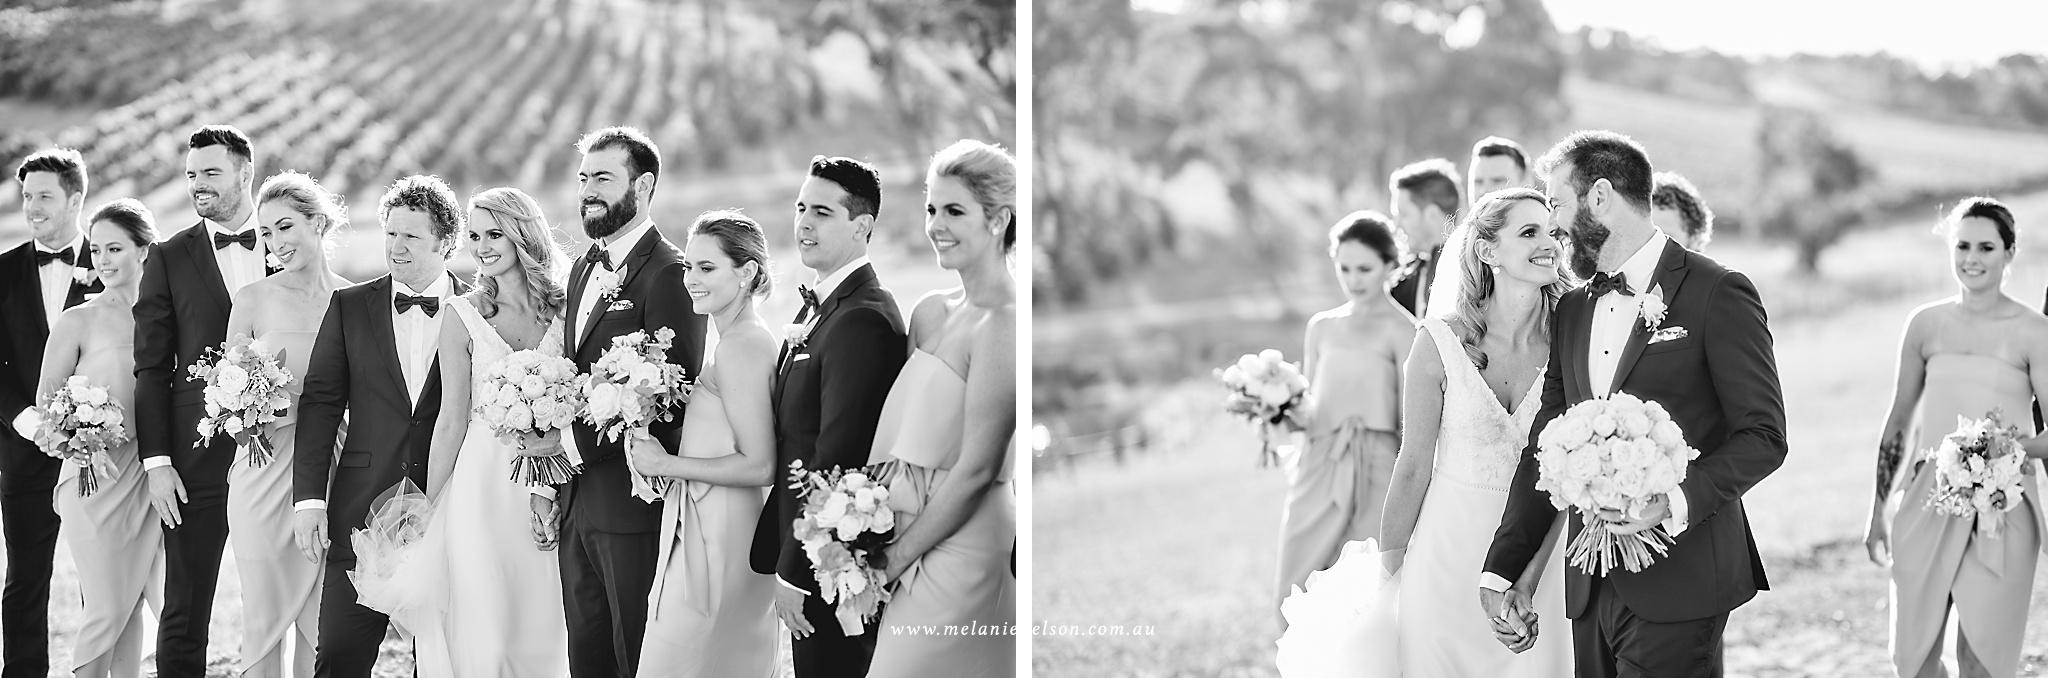 longview_vineyard_wedding_0054.jpg